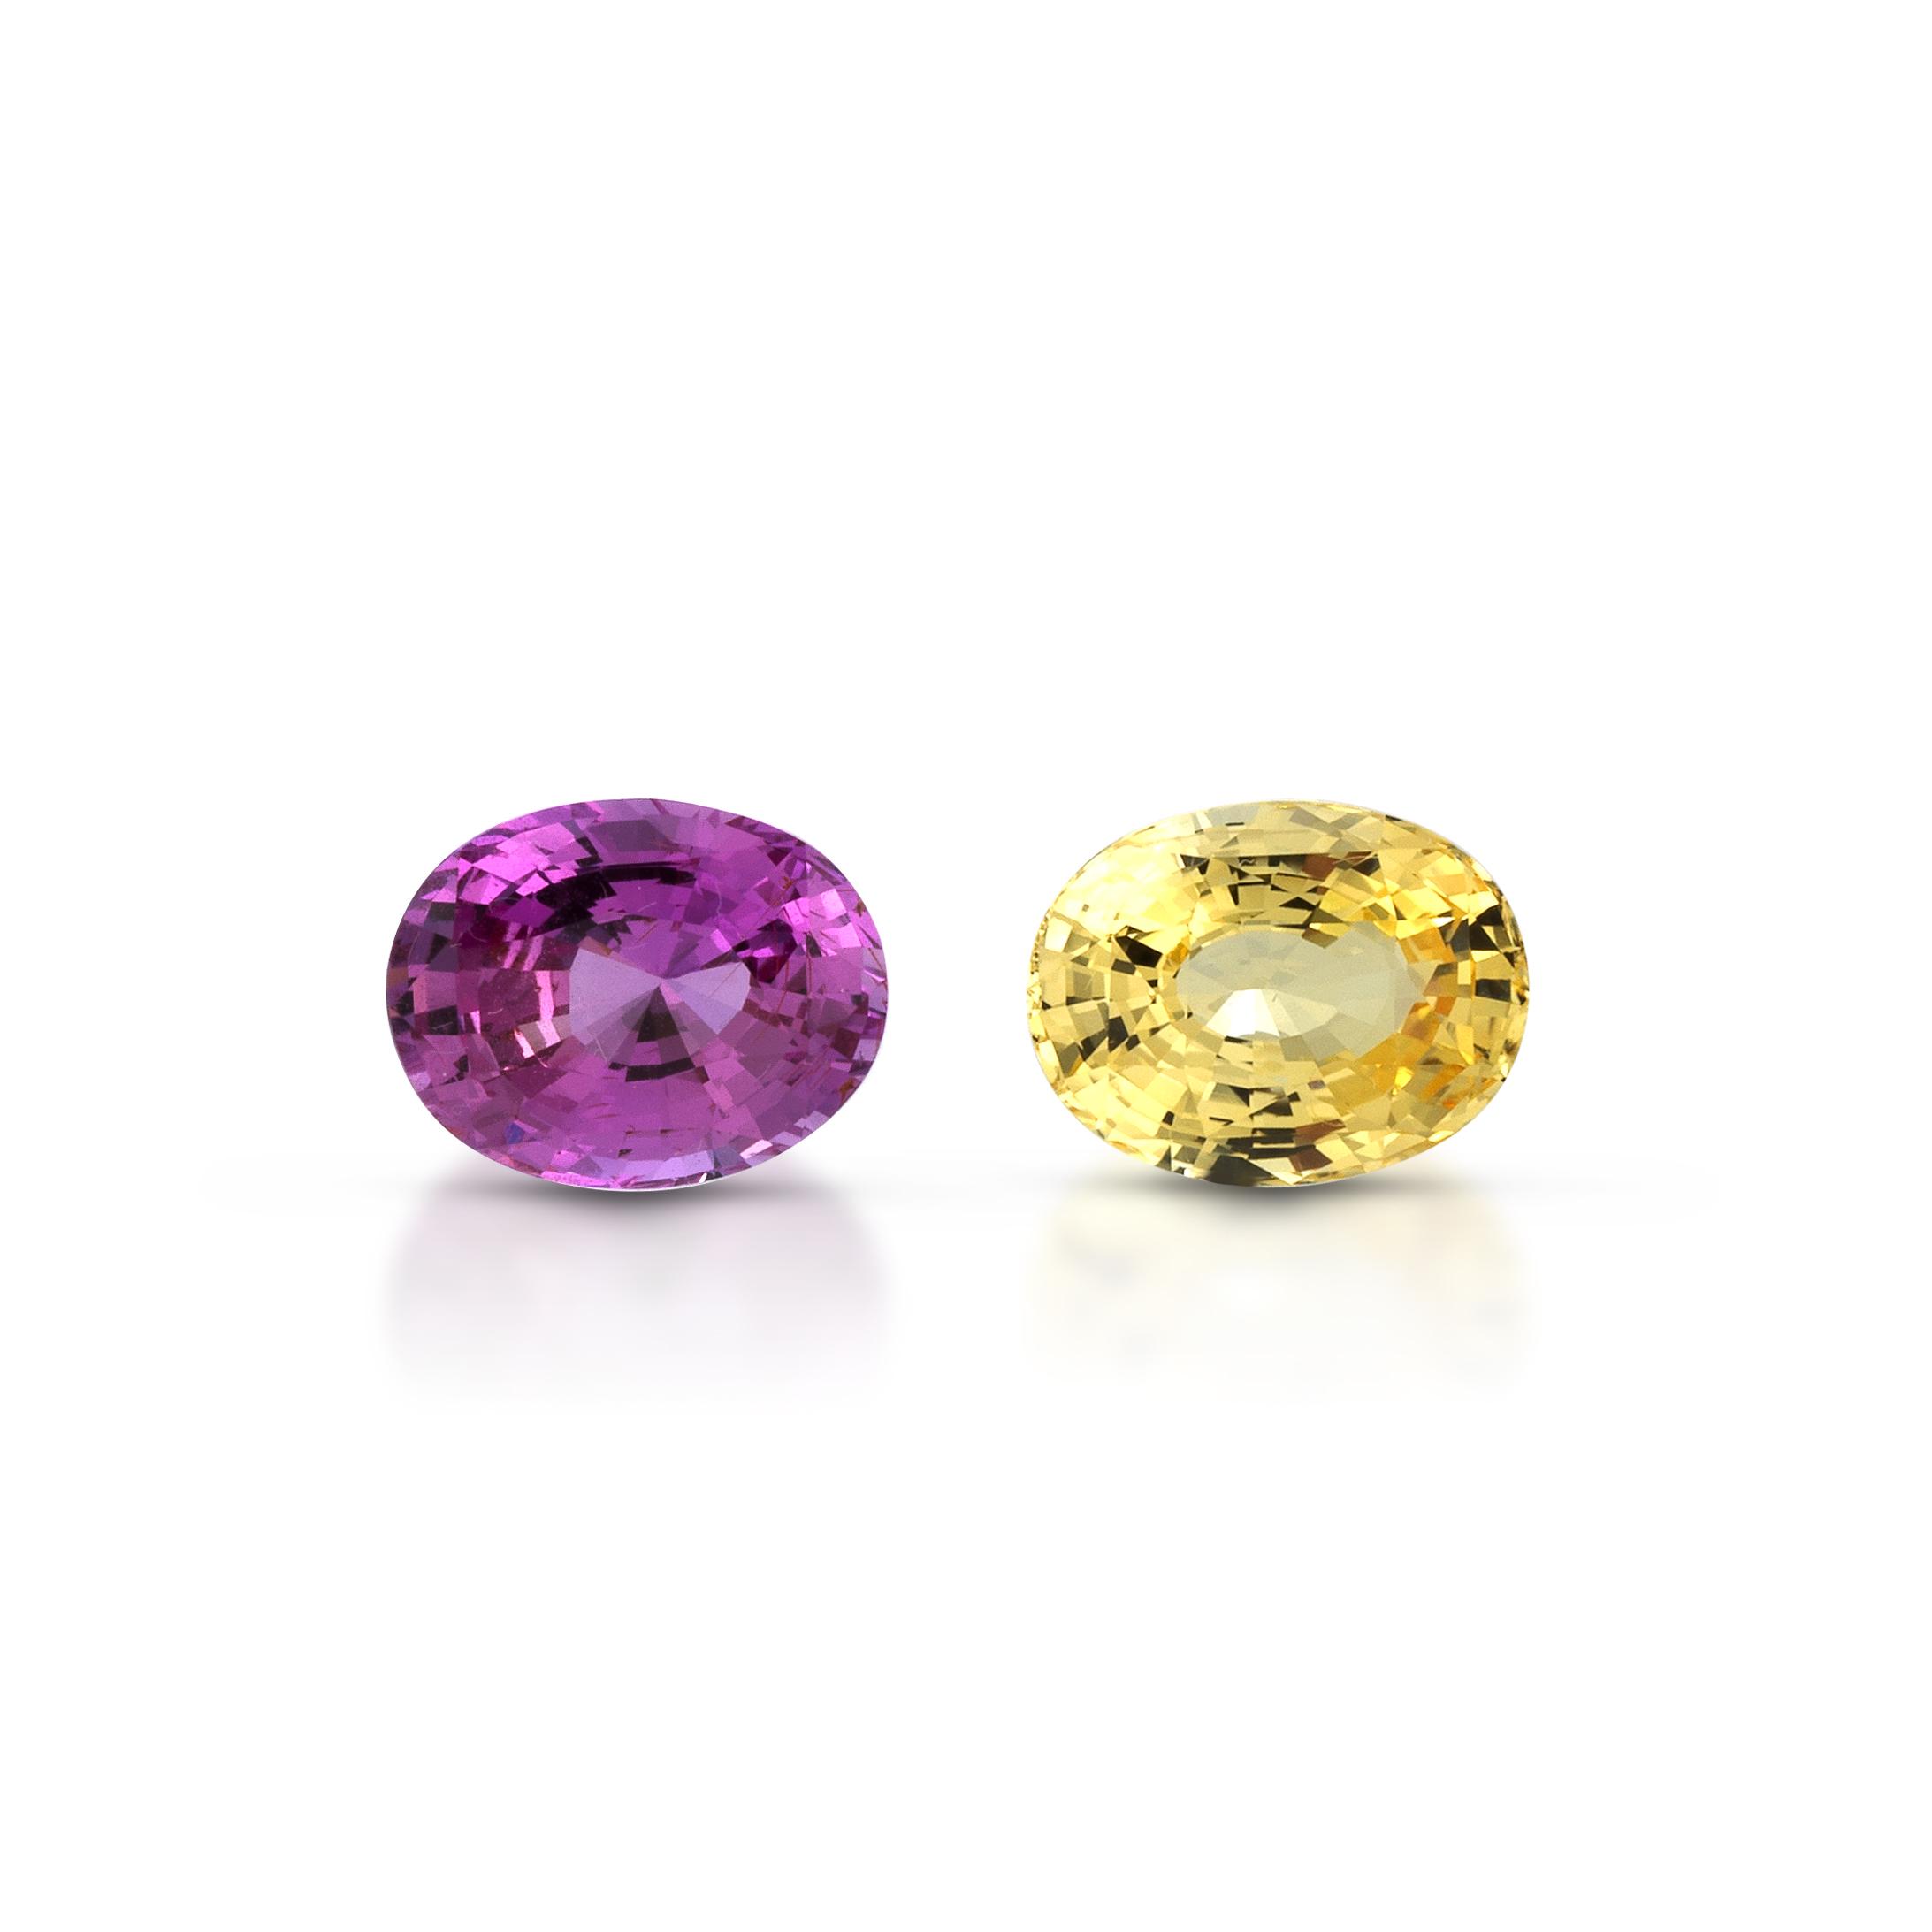 ClaudiaHamann_PreciousPair_YellowSapphire3,14cts_UnheatedCeylon_PinkSapphire3,41cts_Ceylon